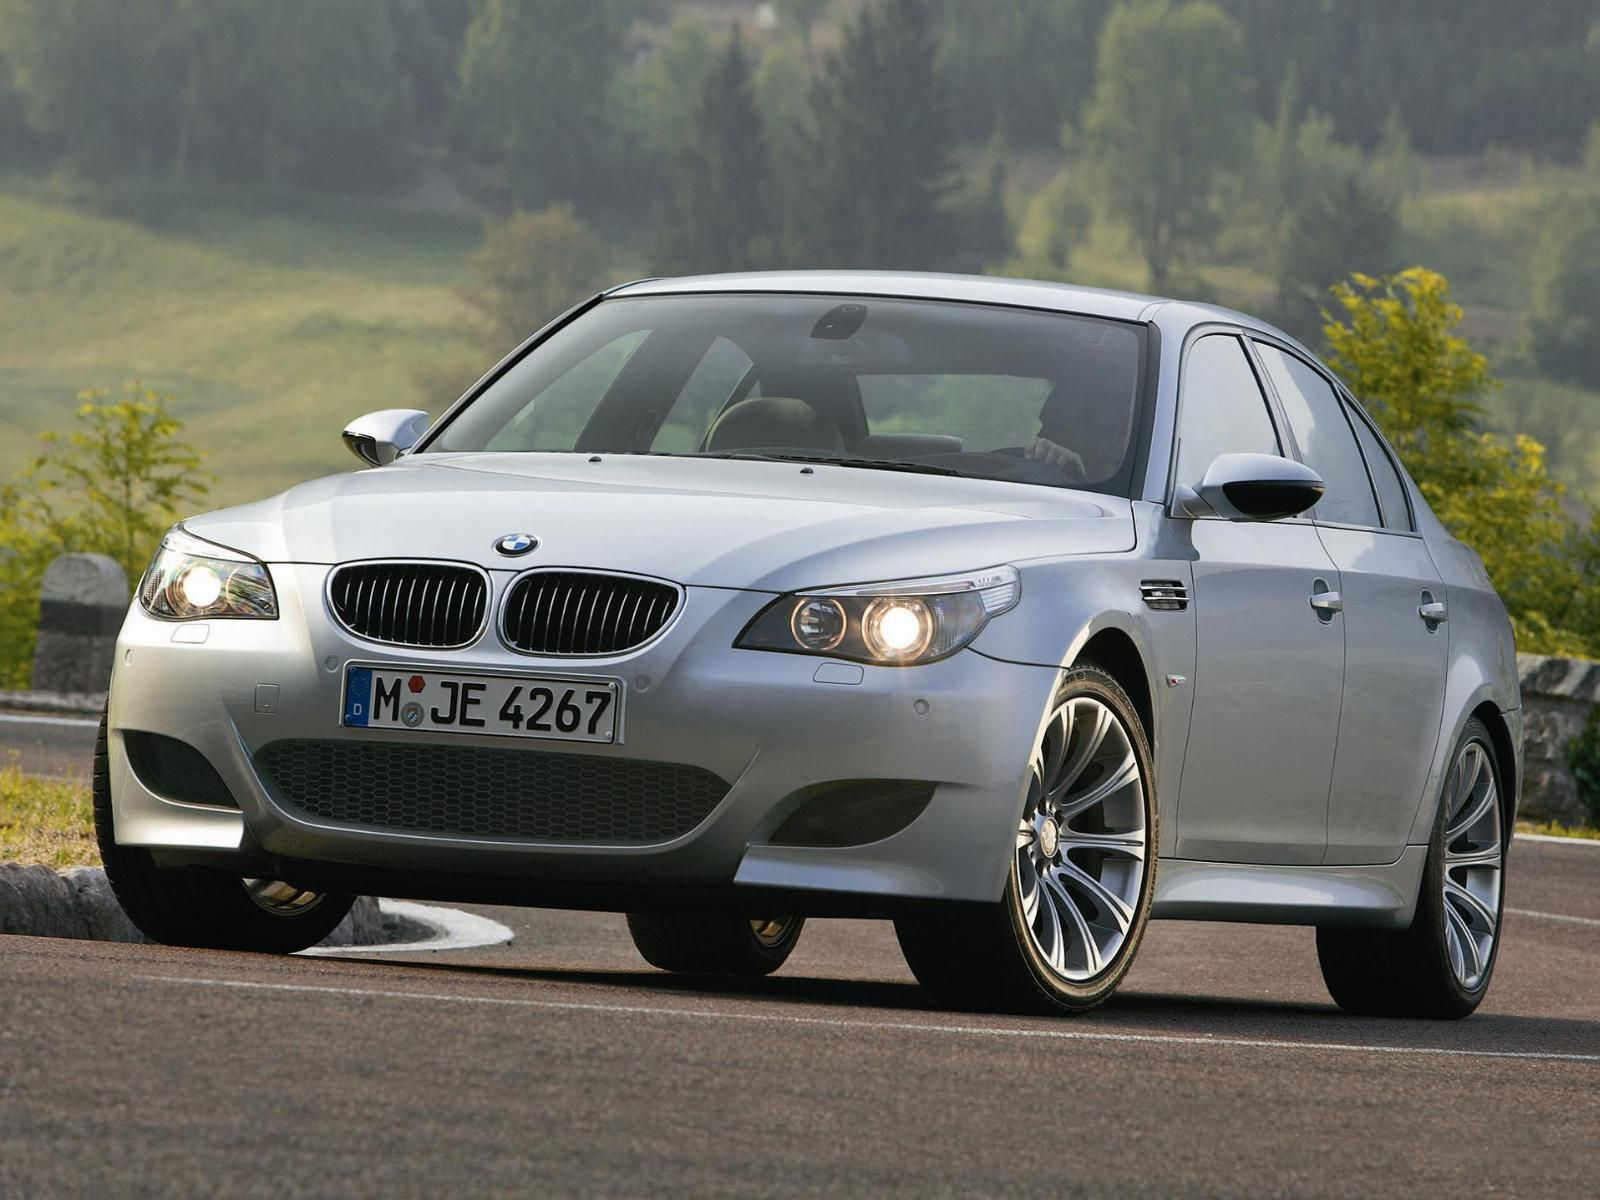 BMW M5 E60 5 Series (2003-2010) | Bmw m5, Motor v10, Bmw